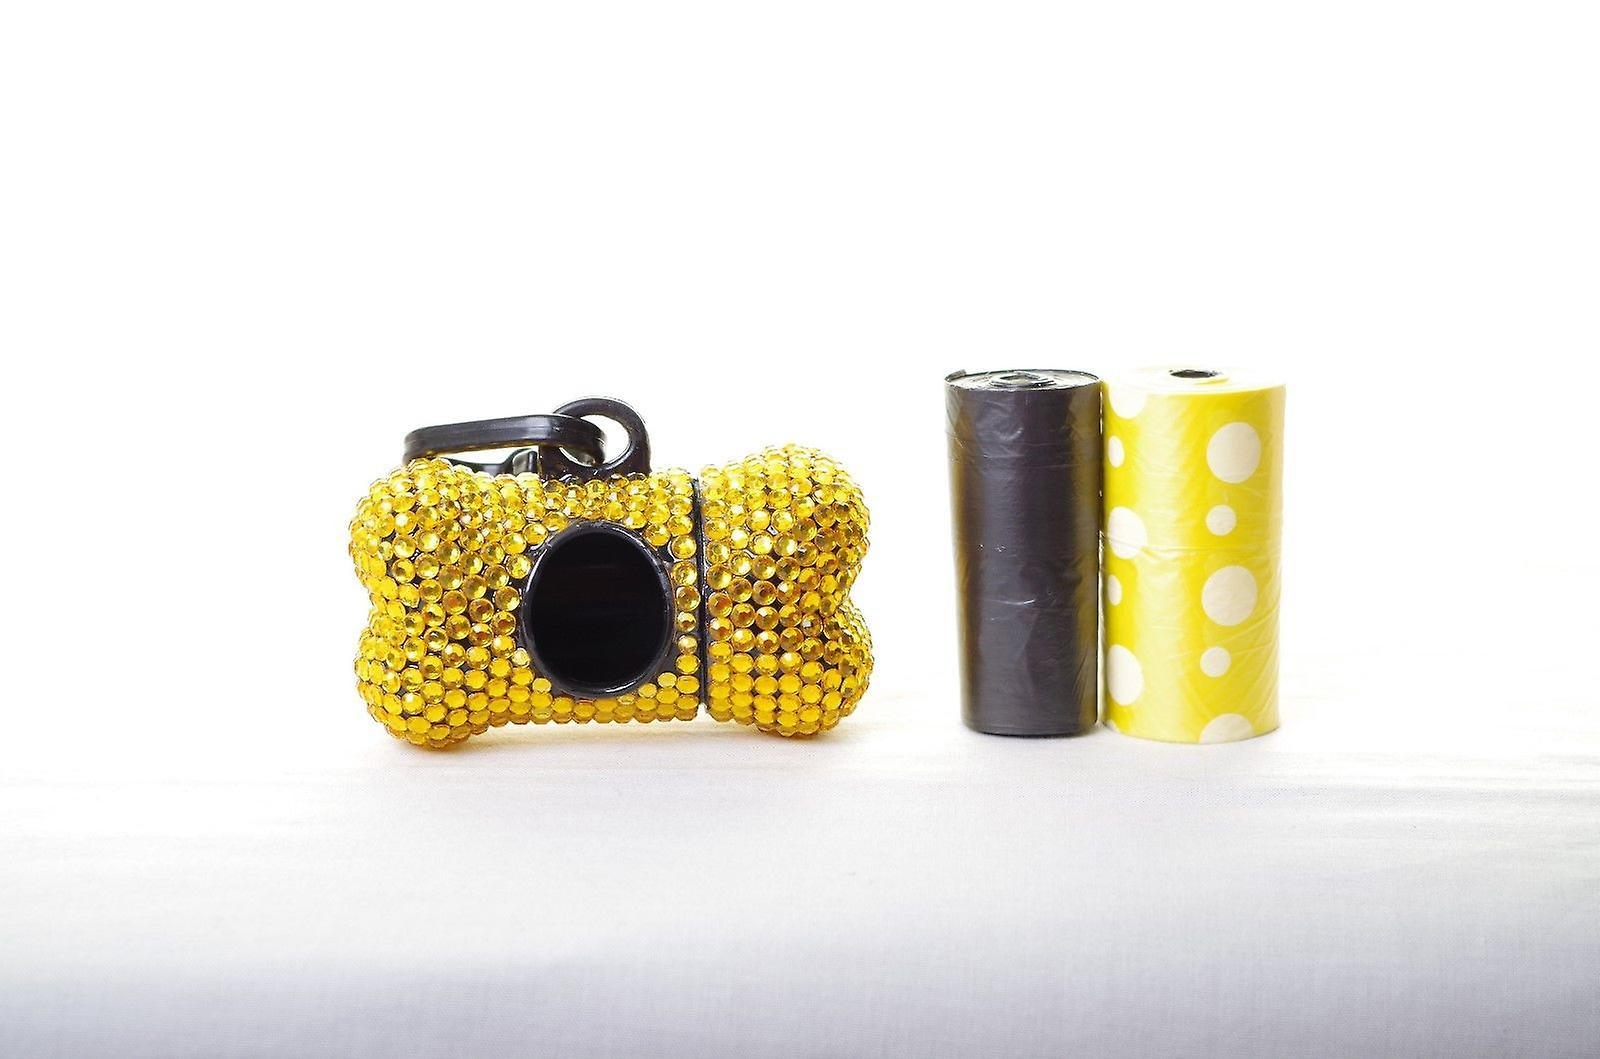 Gold Crystal Rhinestone Bone shaped Waste Bag Dispenser